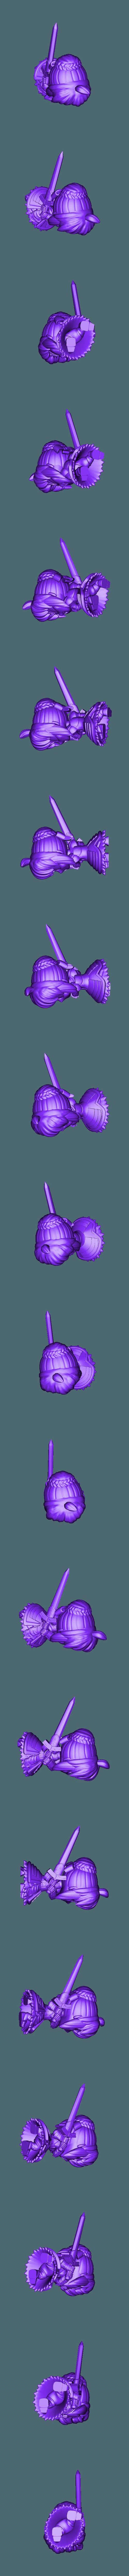 Saber.stl Download free STL file Chibi Saber | Arturia • 3D print model, HyperMiniatures